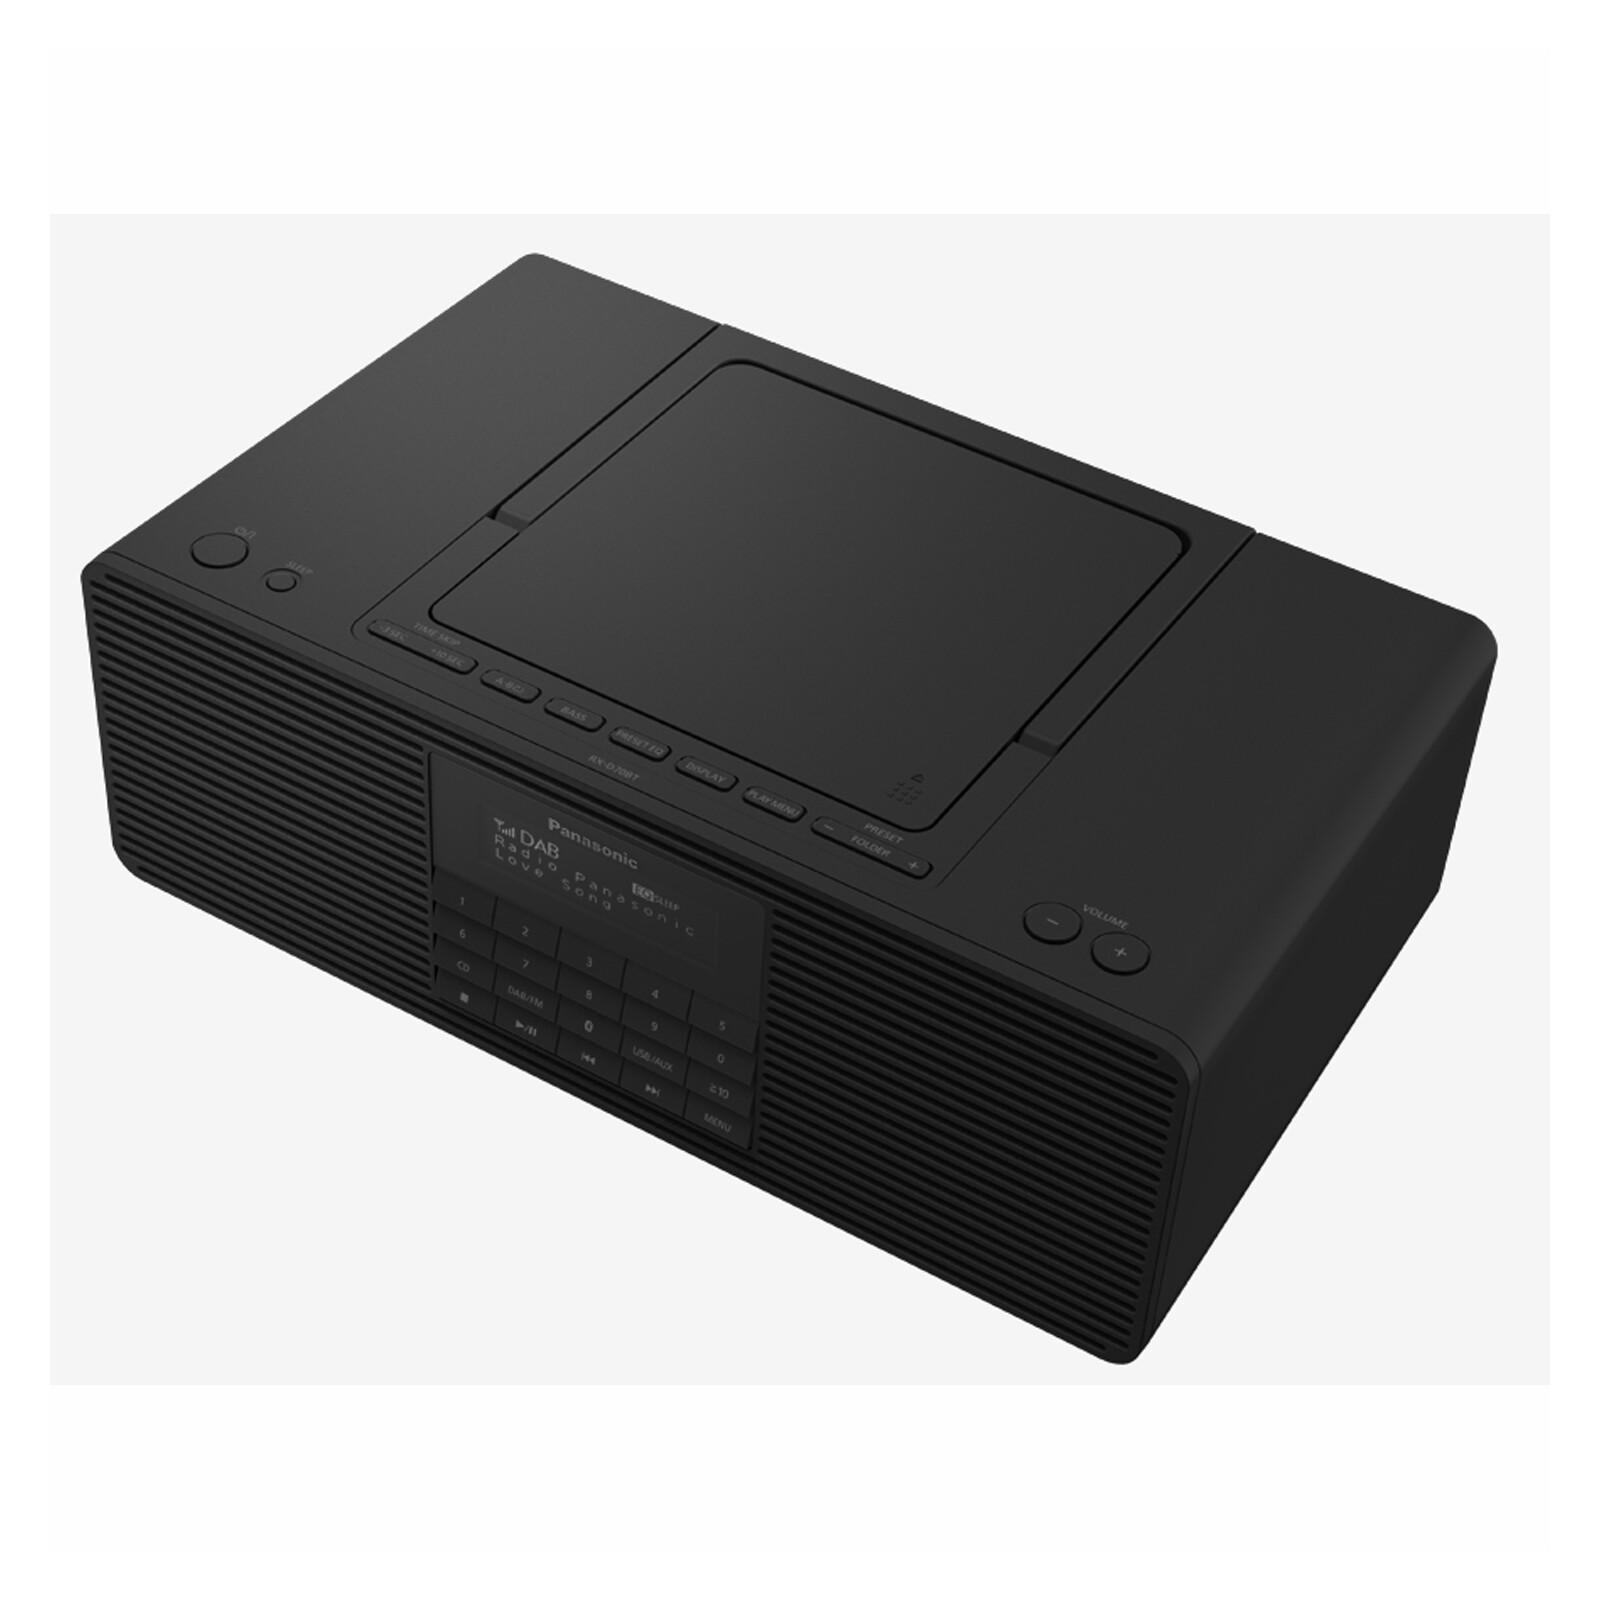 Panasonic RX-D70BTEG-K DAB+ Radio